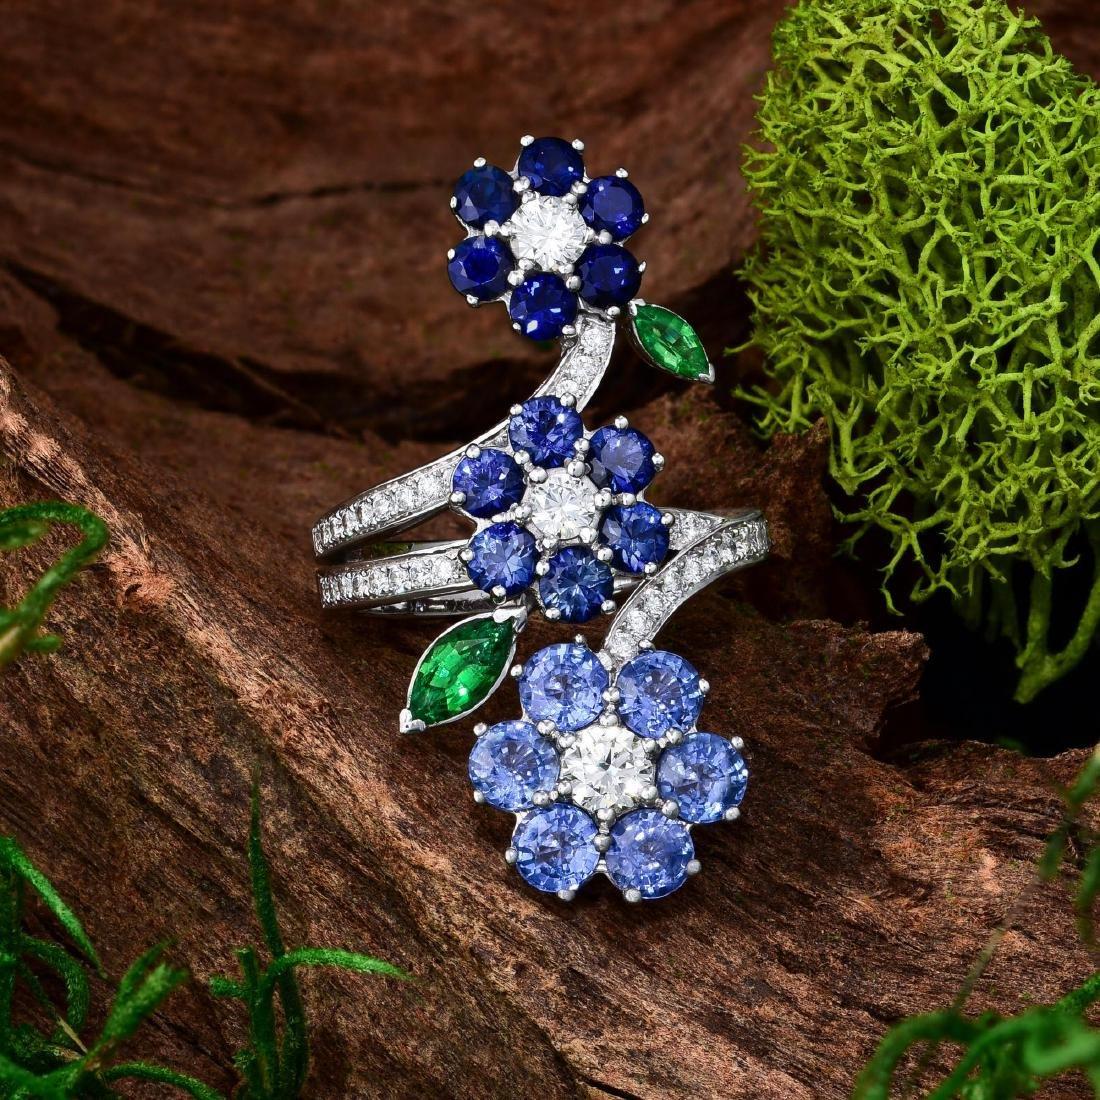 Van Cleef & Arpels Folie des Pres Sapphire Ring